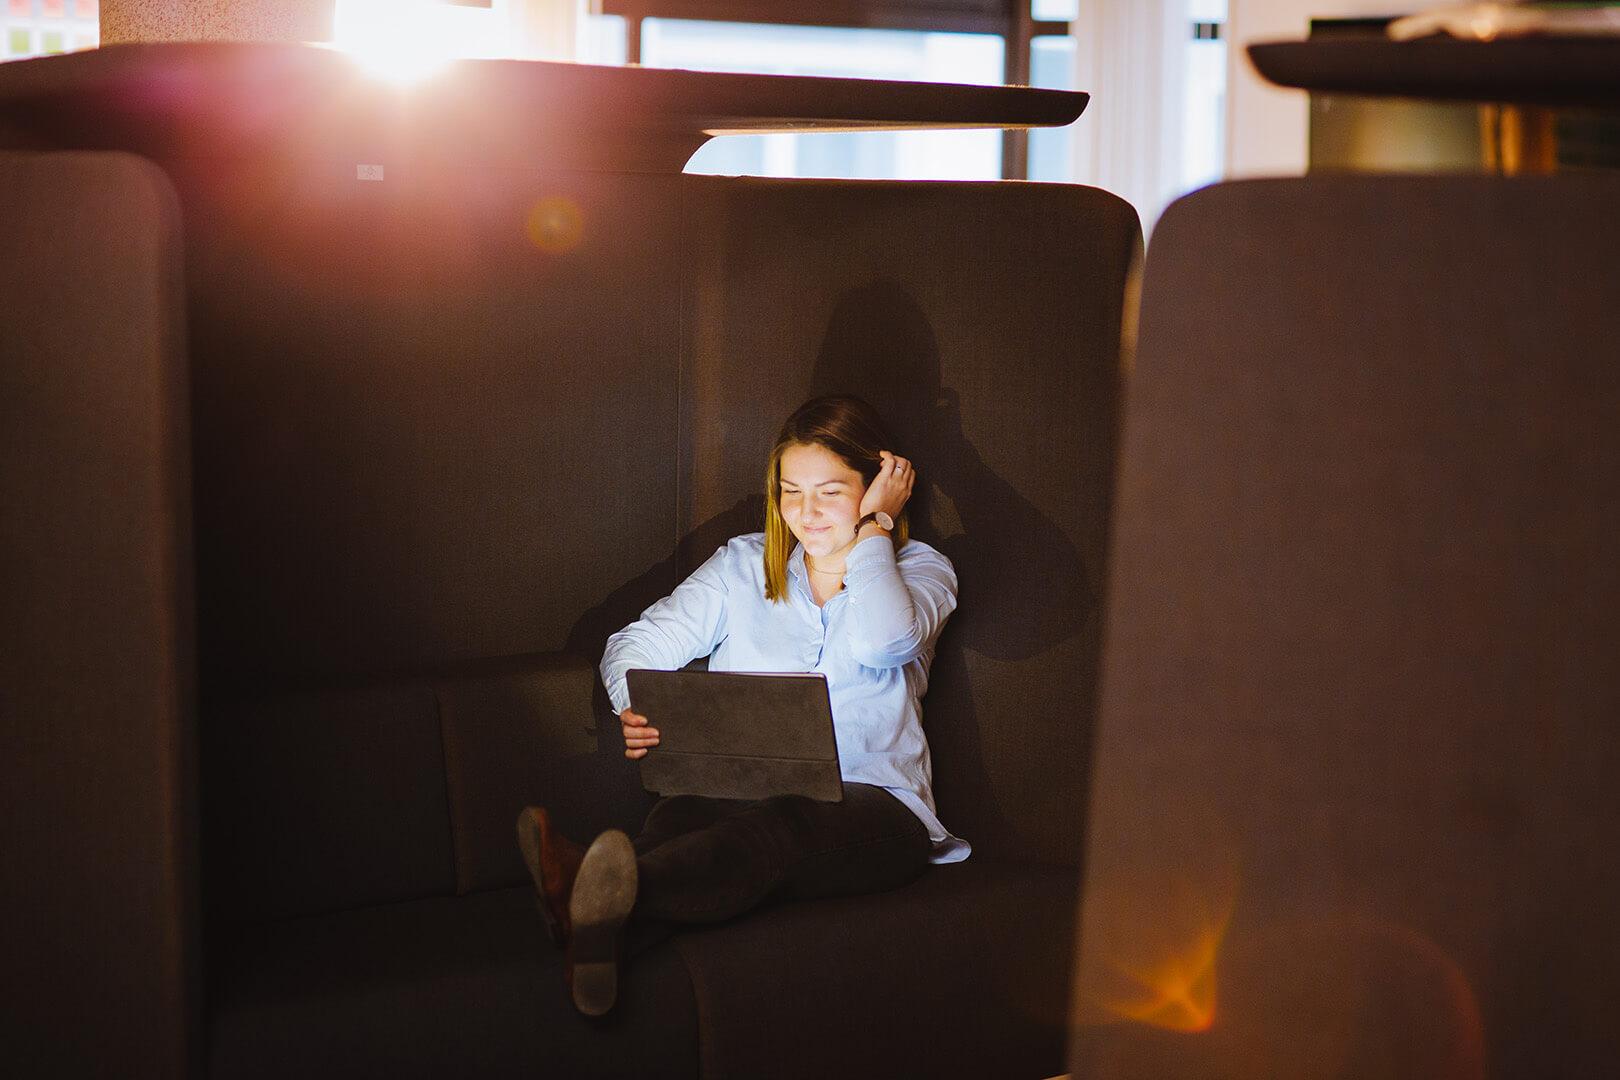 Frau mit Laptop in Sitzecke